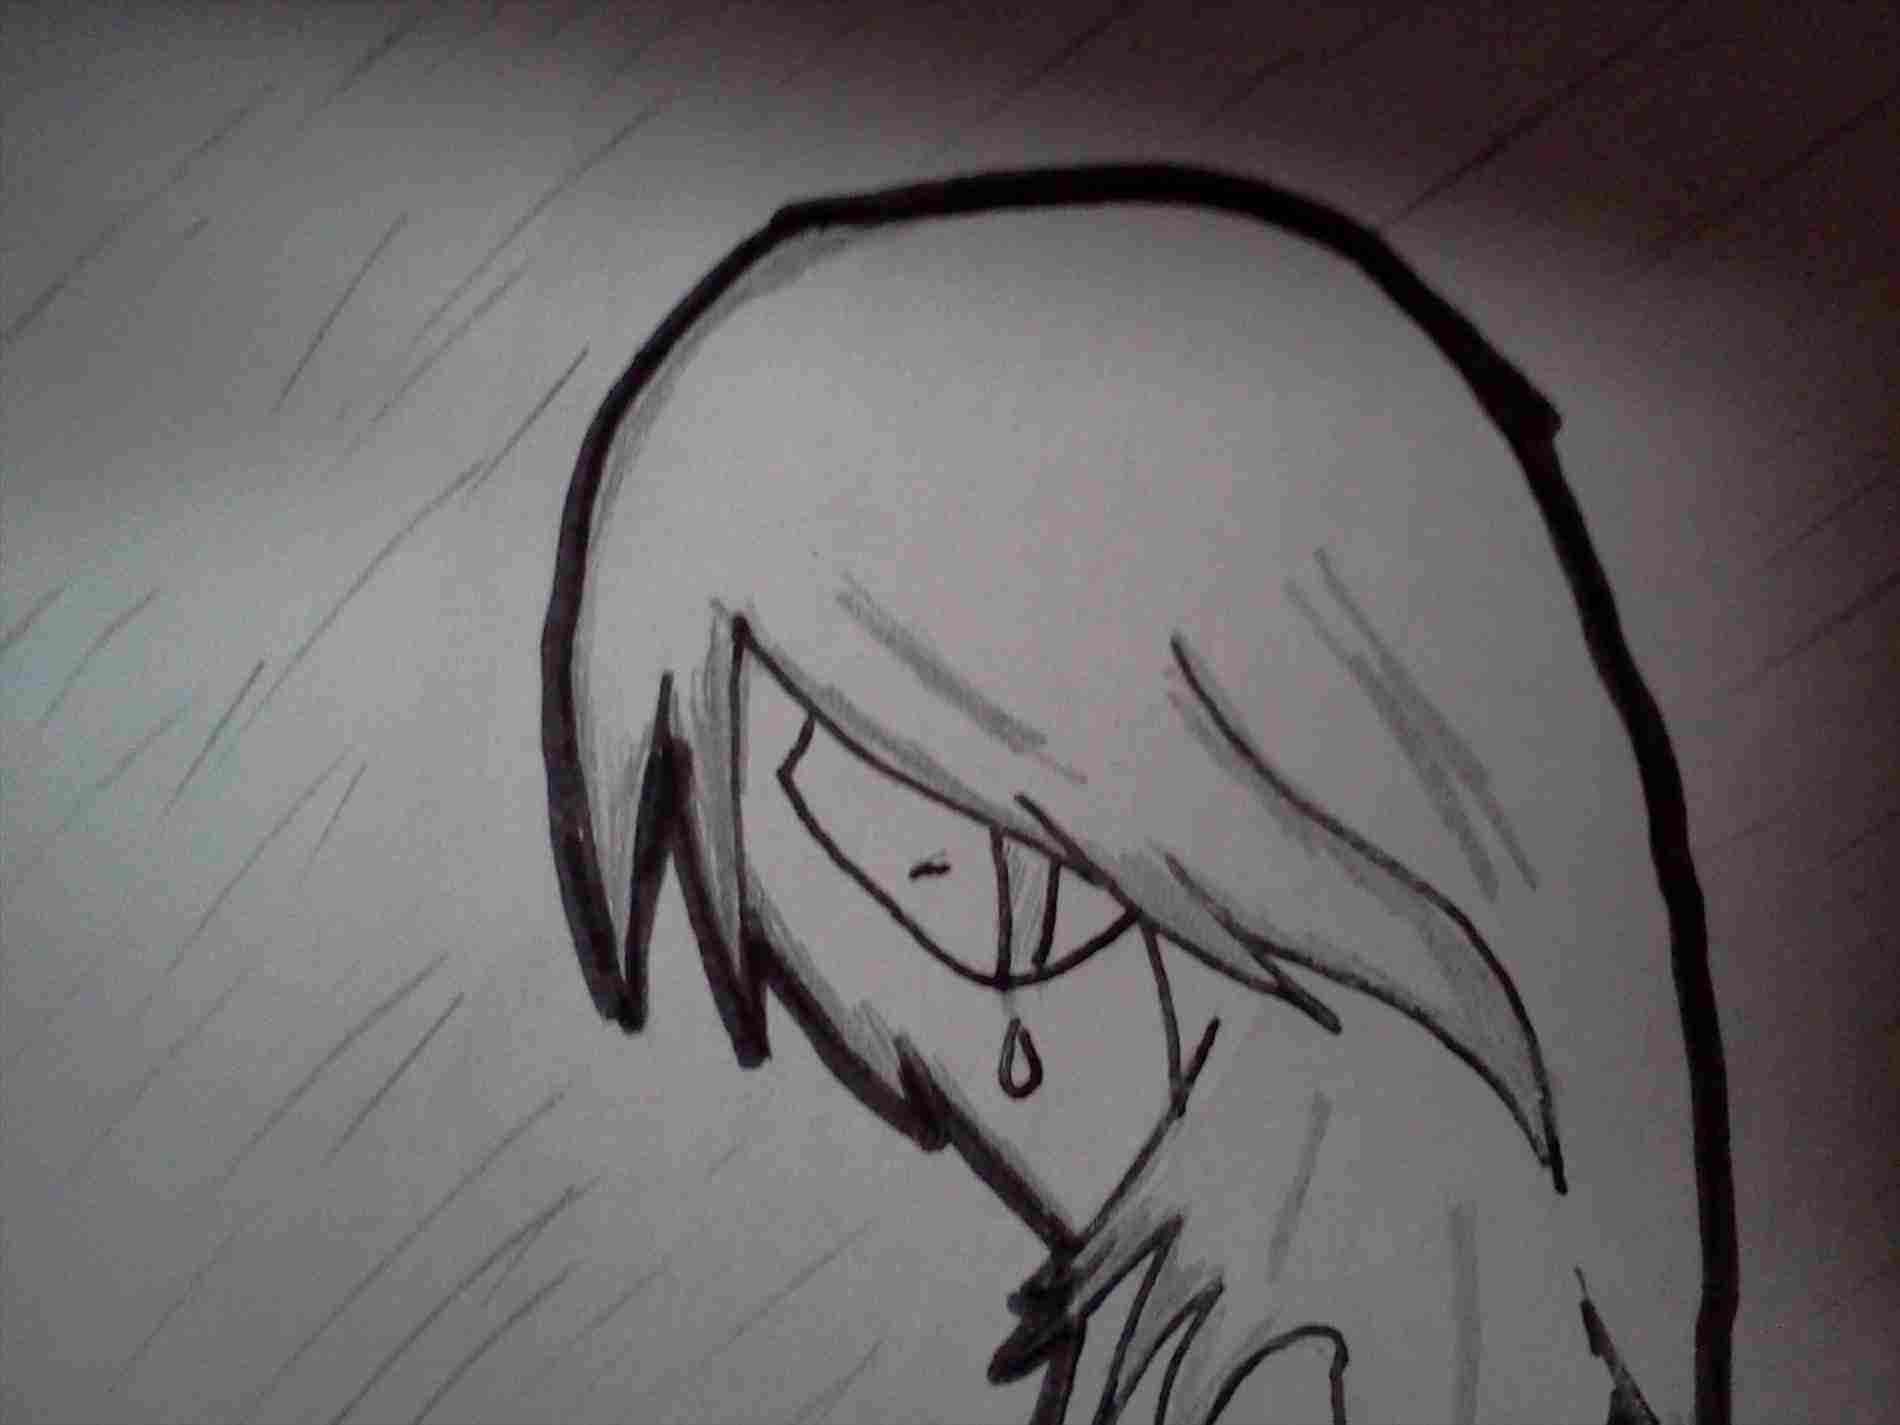 Rarhpterestcom cute sad anime girl crying in the